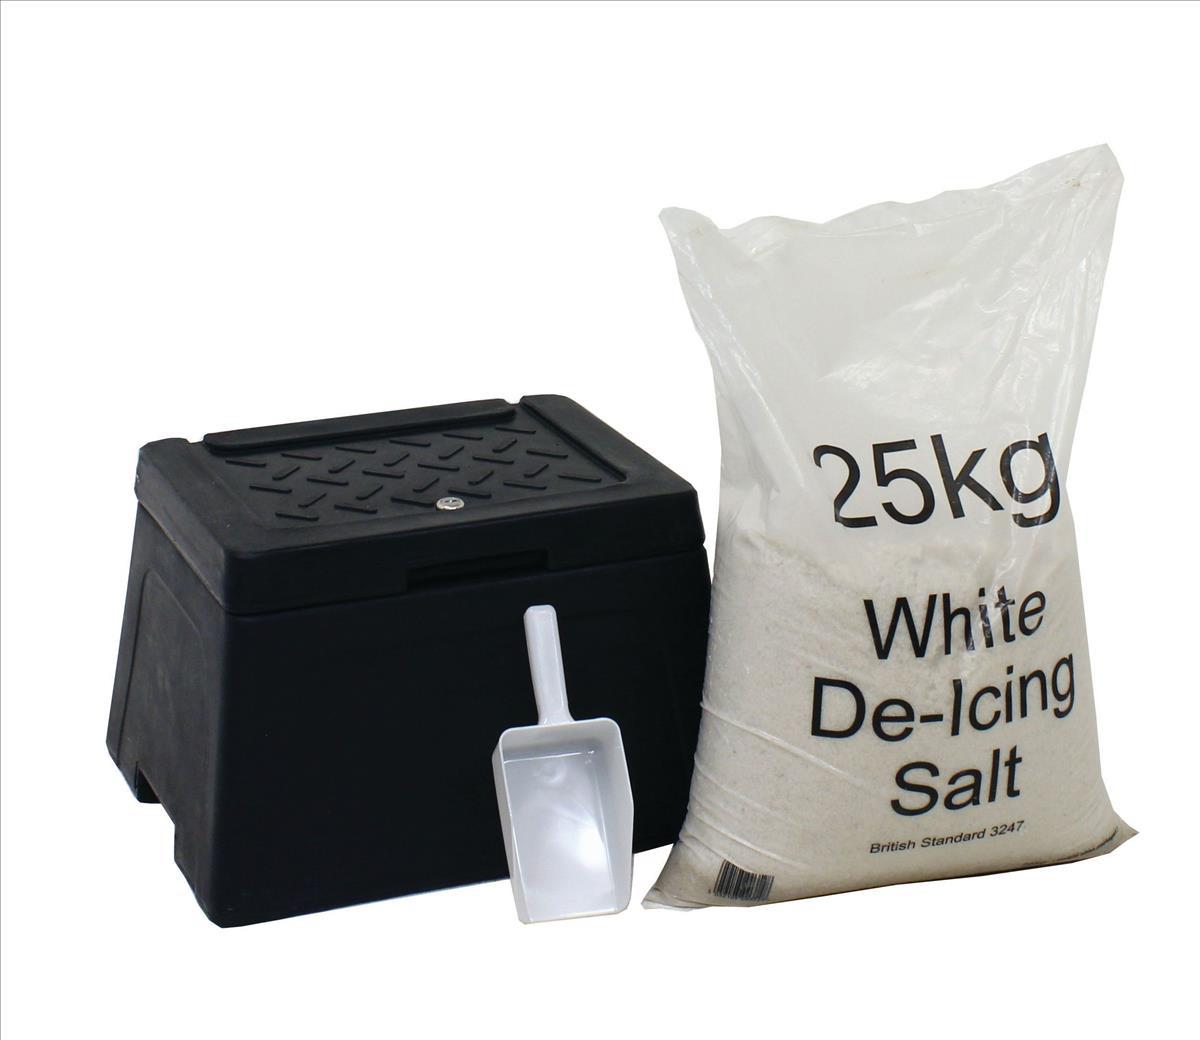 Image for Mini Grit Bin with Scoop and 25kg Salt Bag